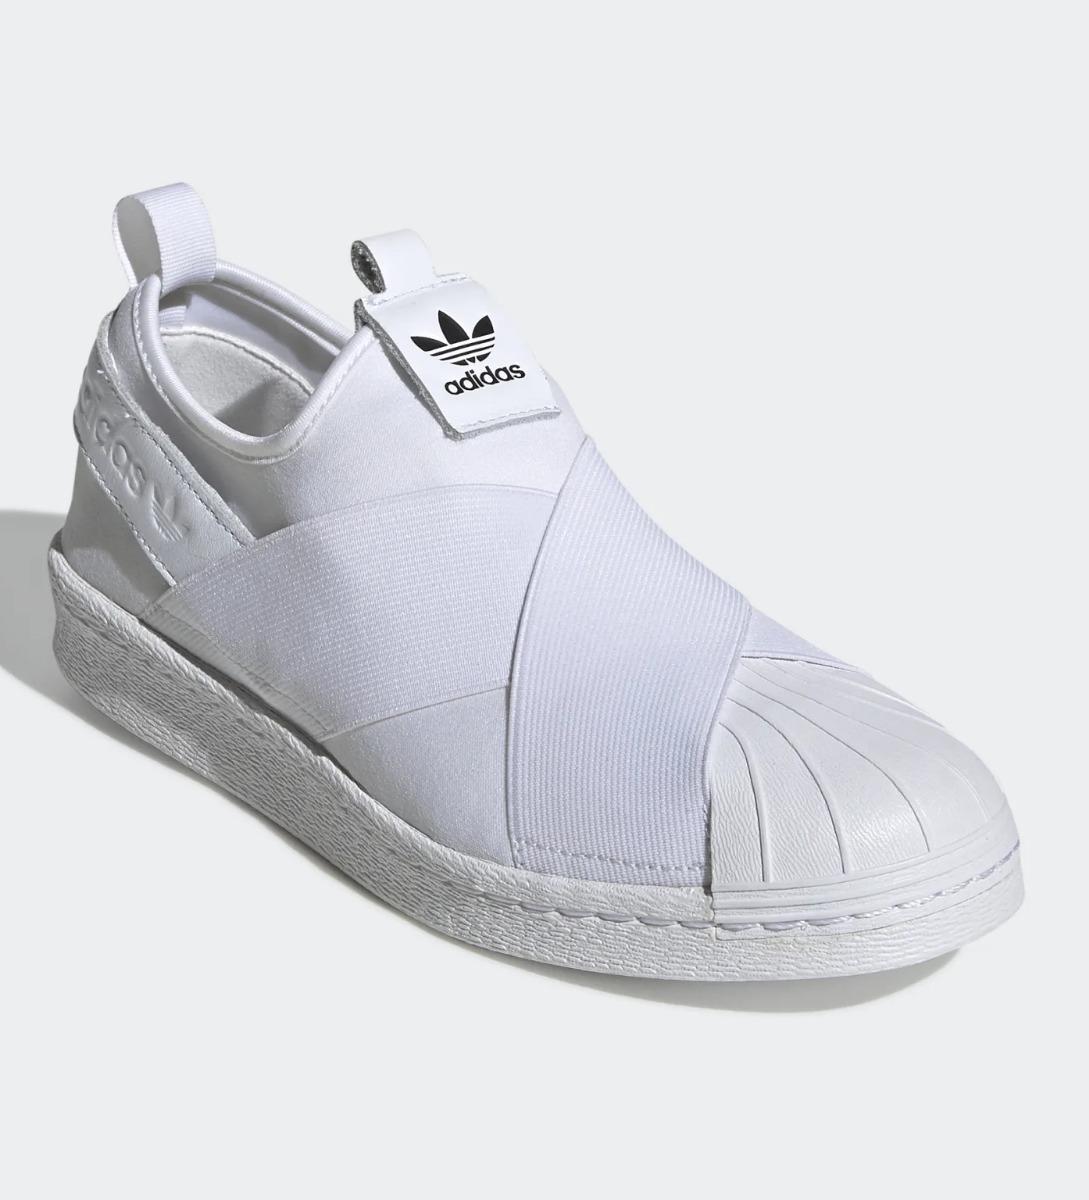 6c604fd1c tênis adidas slip on superstar elástico branco feminino top. Carregando zoom .